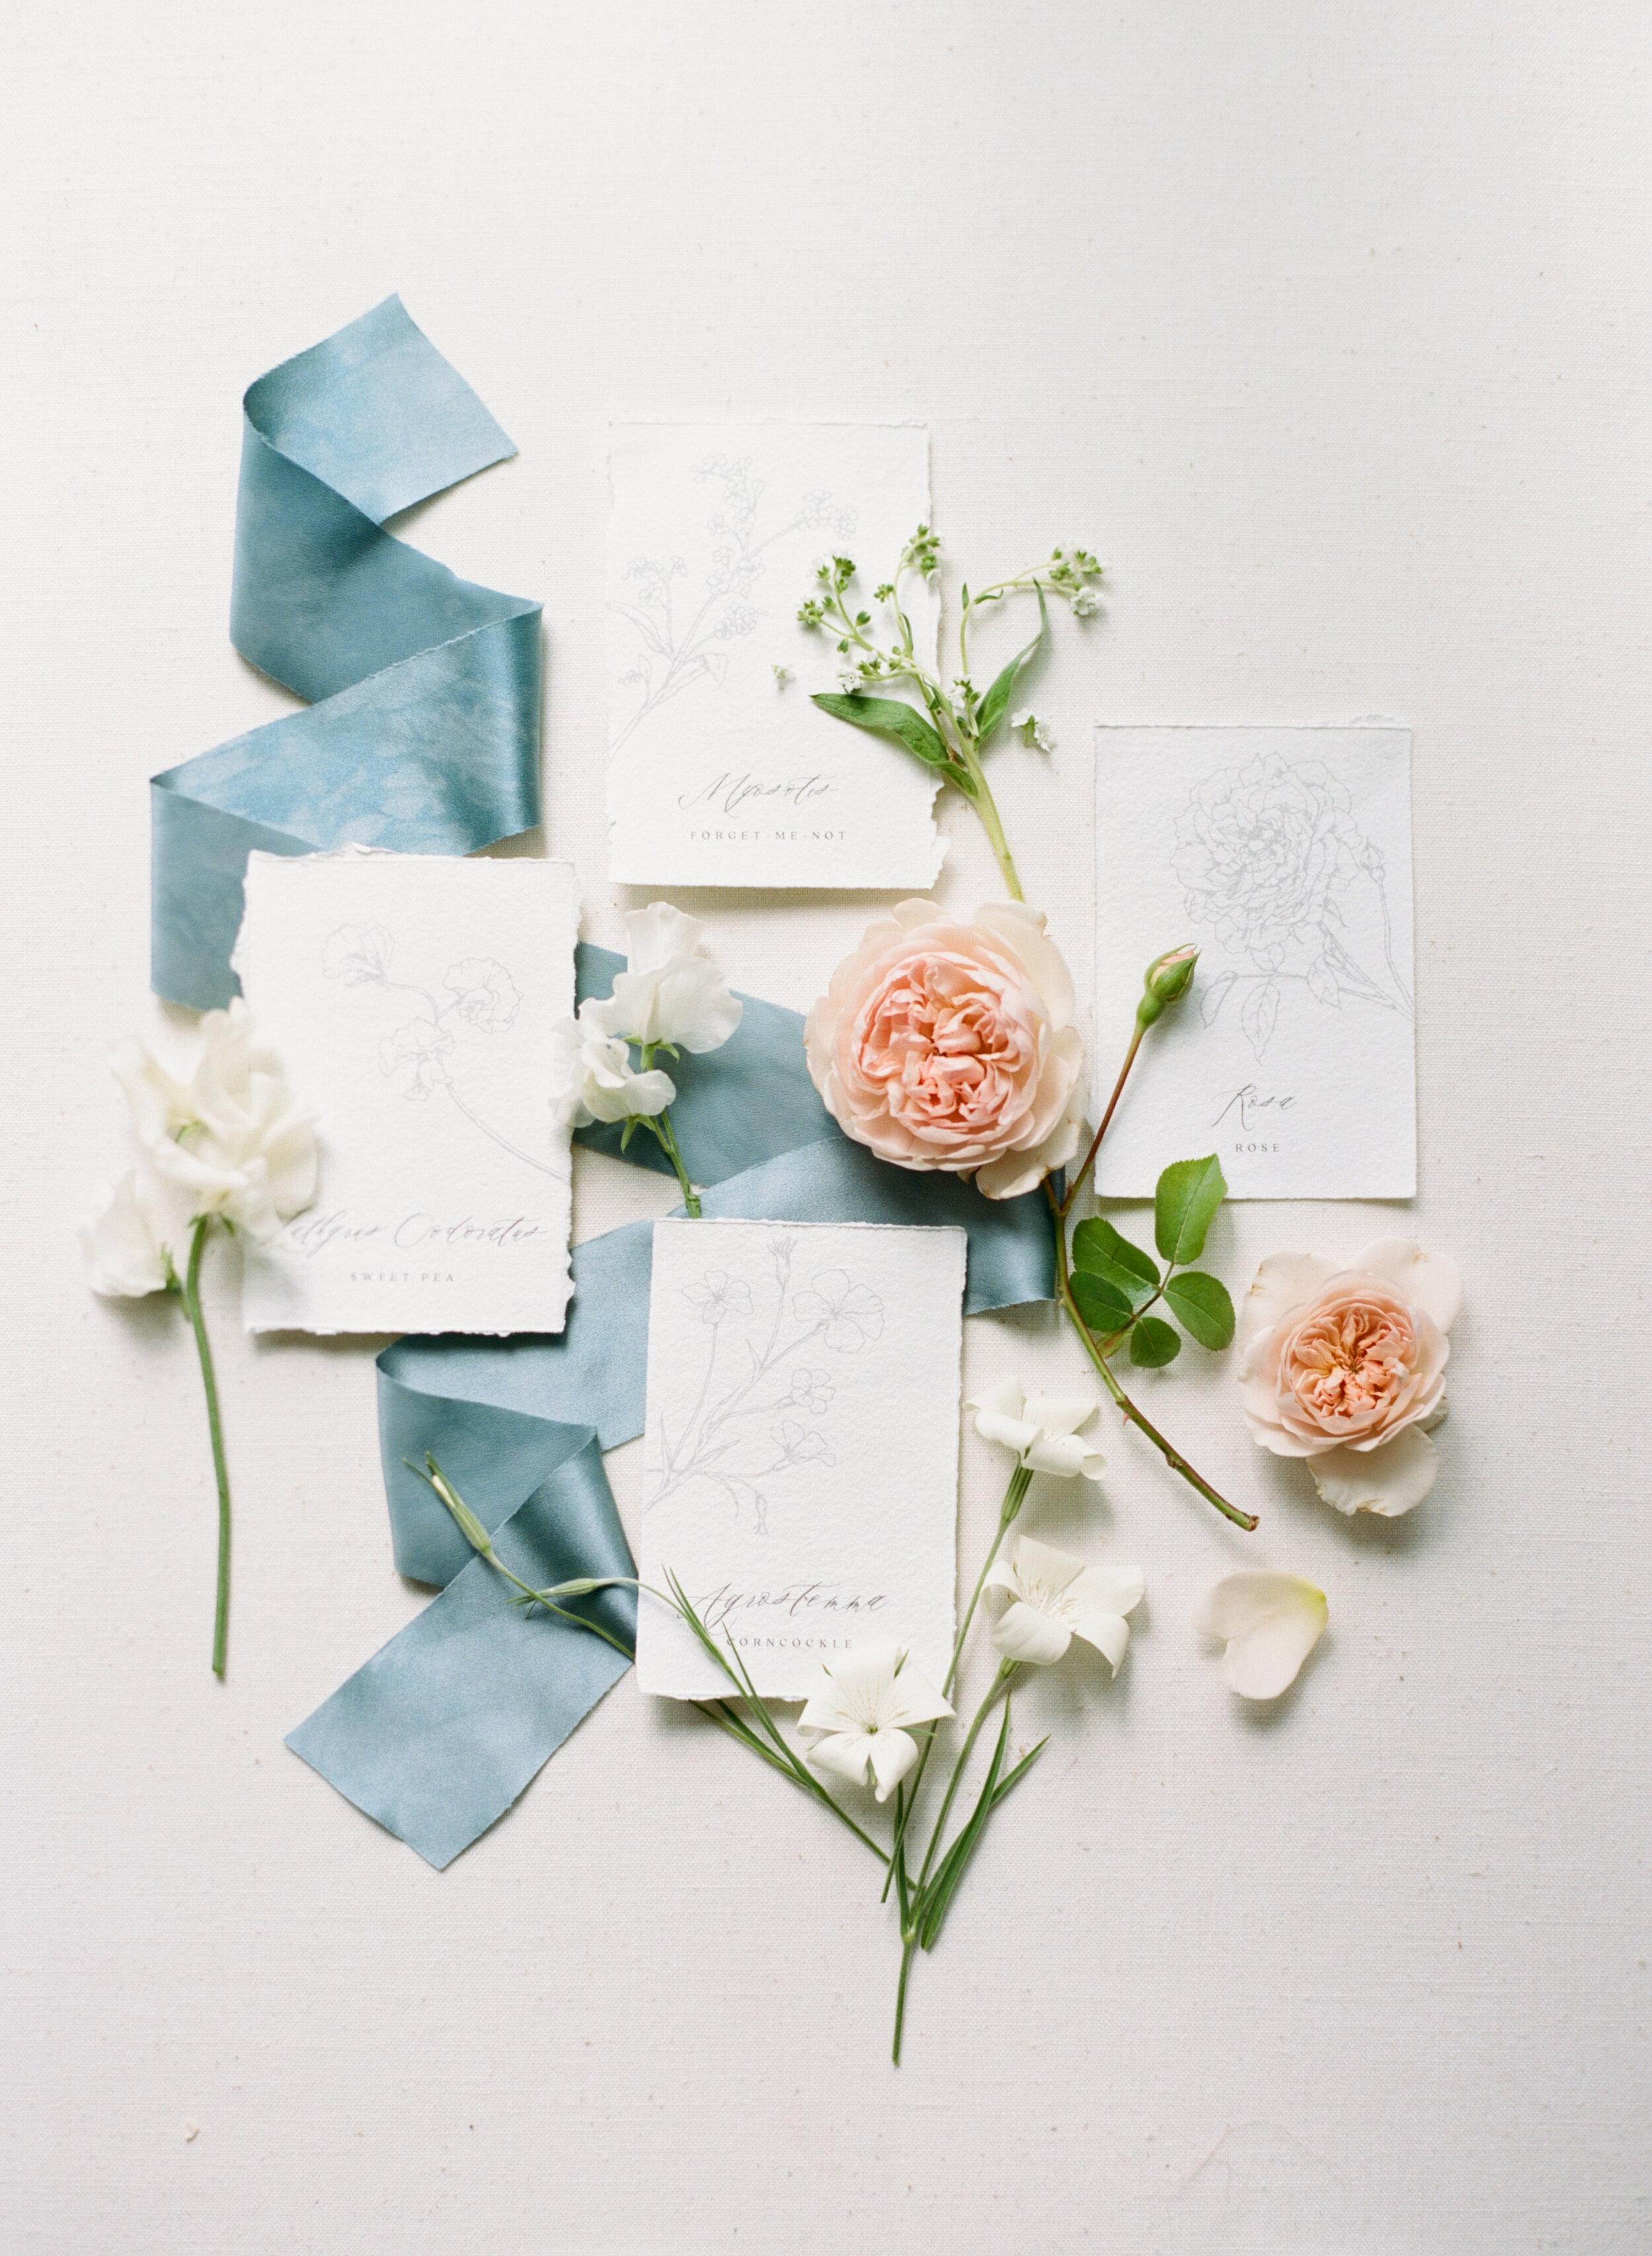 alexandra-meseke-understated-soft-luxury-wedding-upstate-ny_0015.jpg